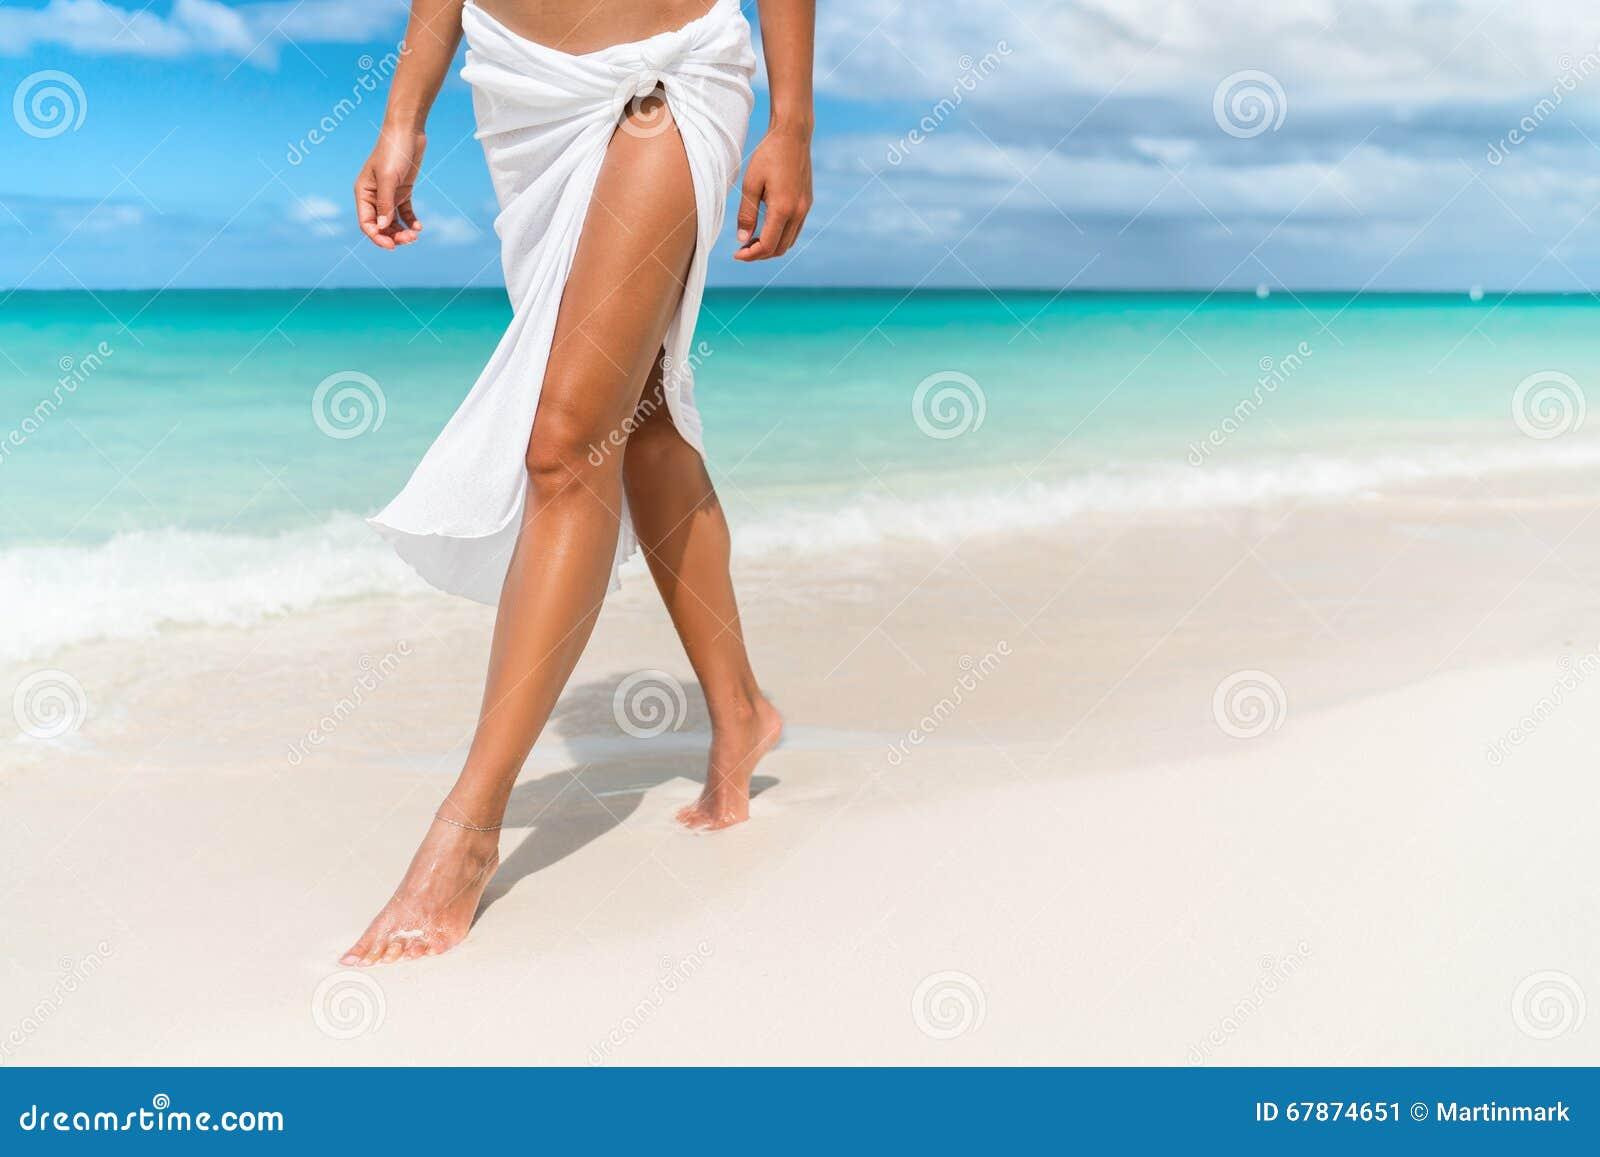 Caribbean beach travel - woman legs closeup walking on sand